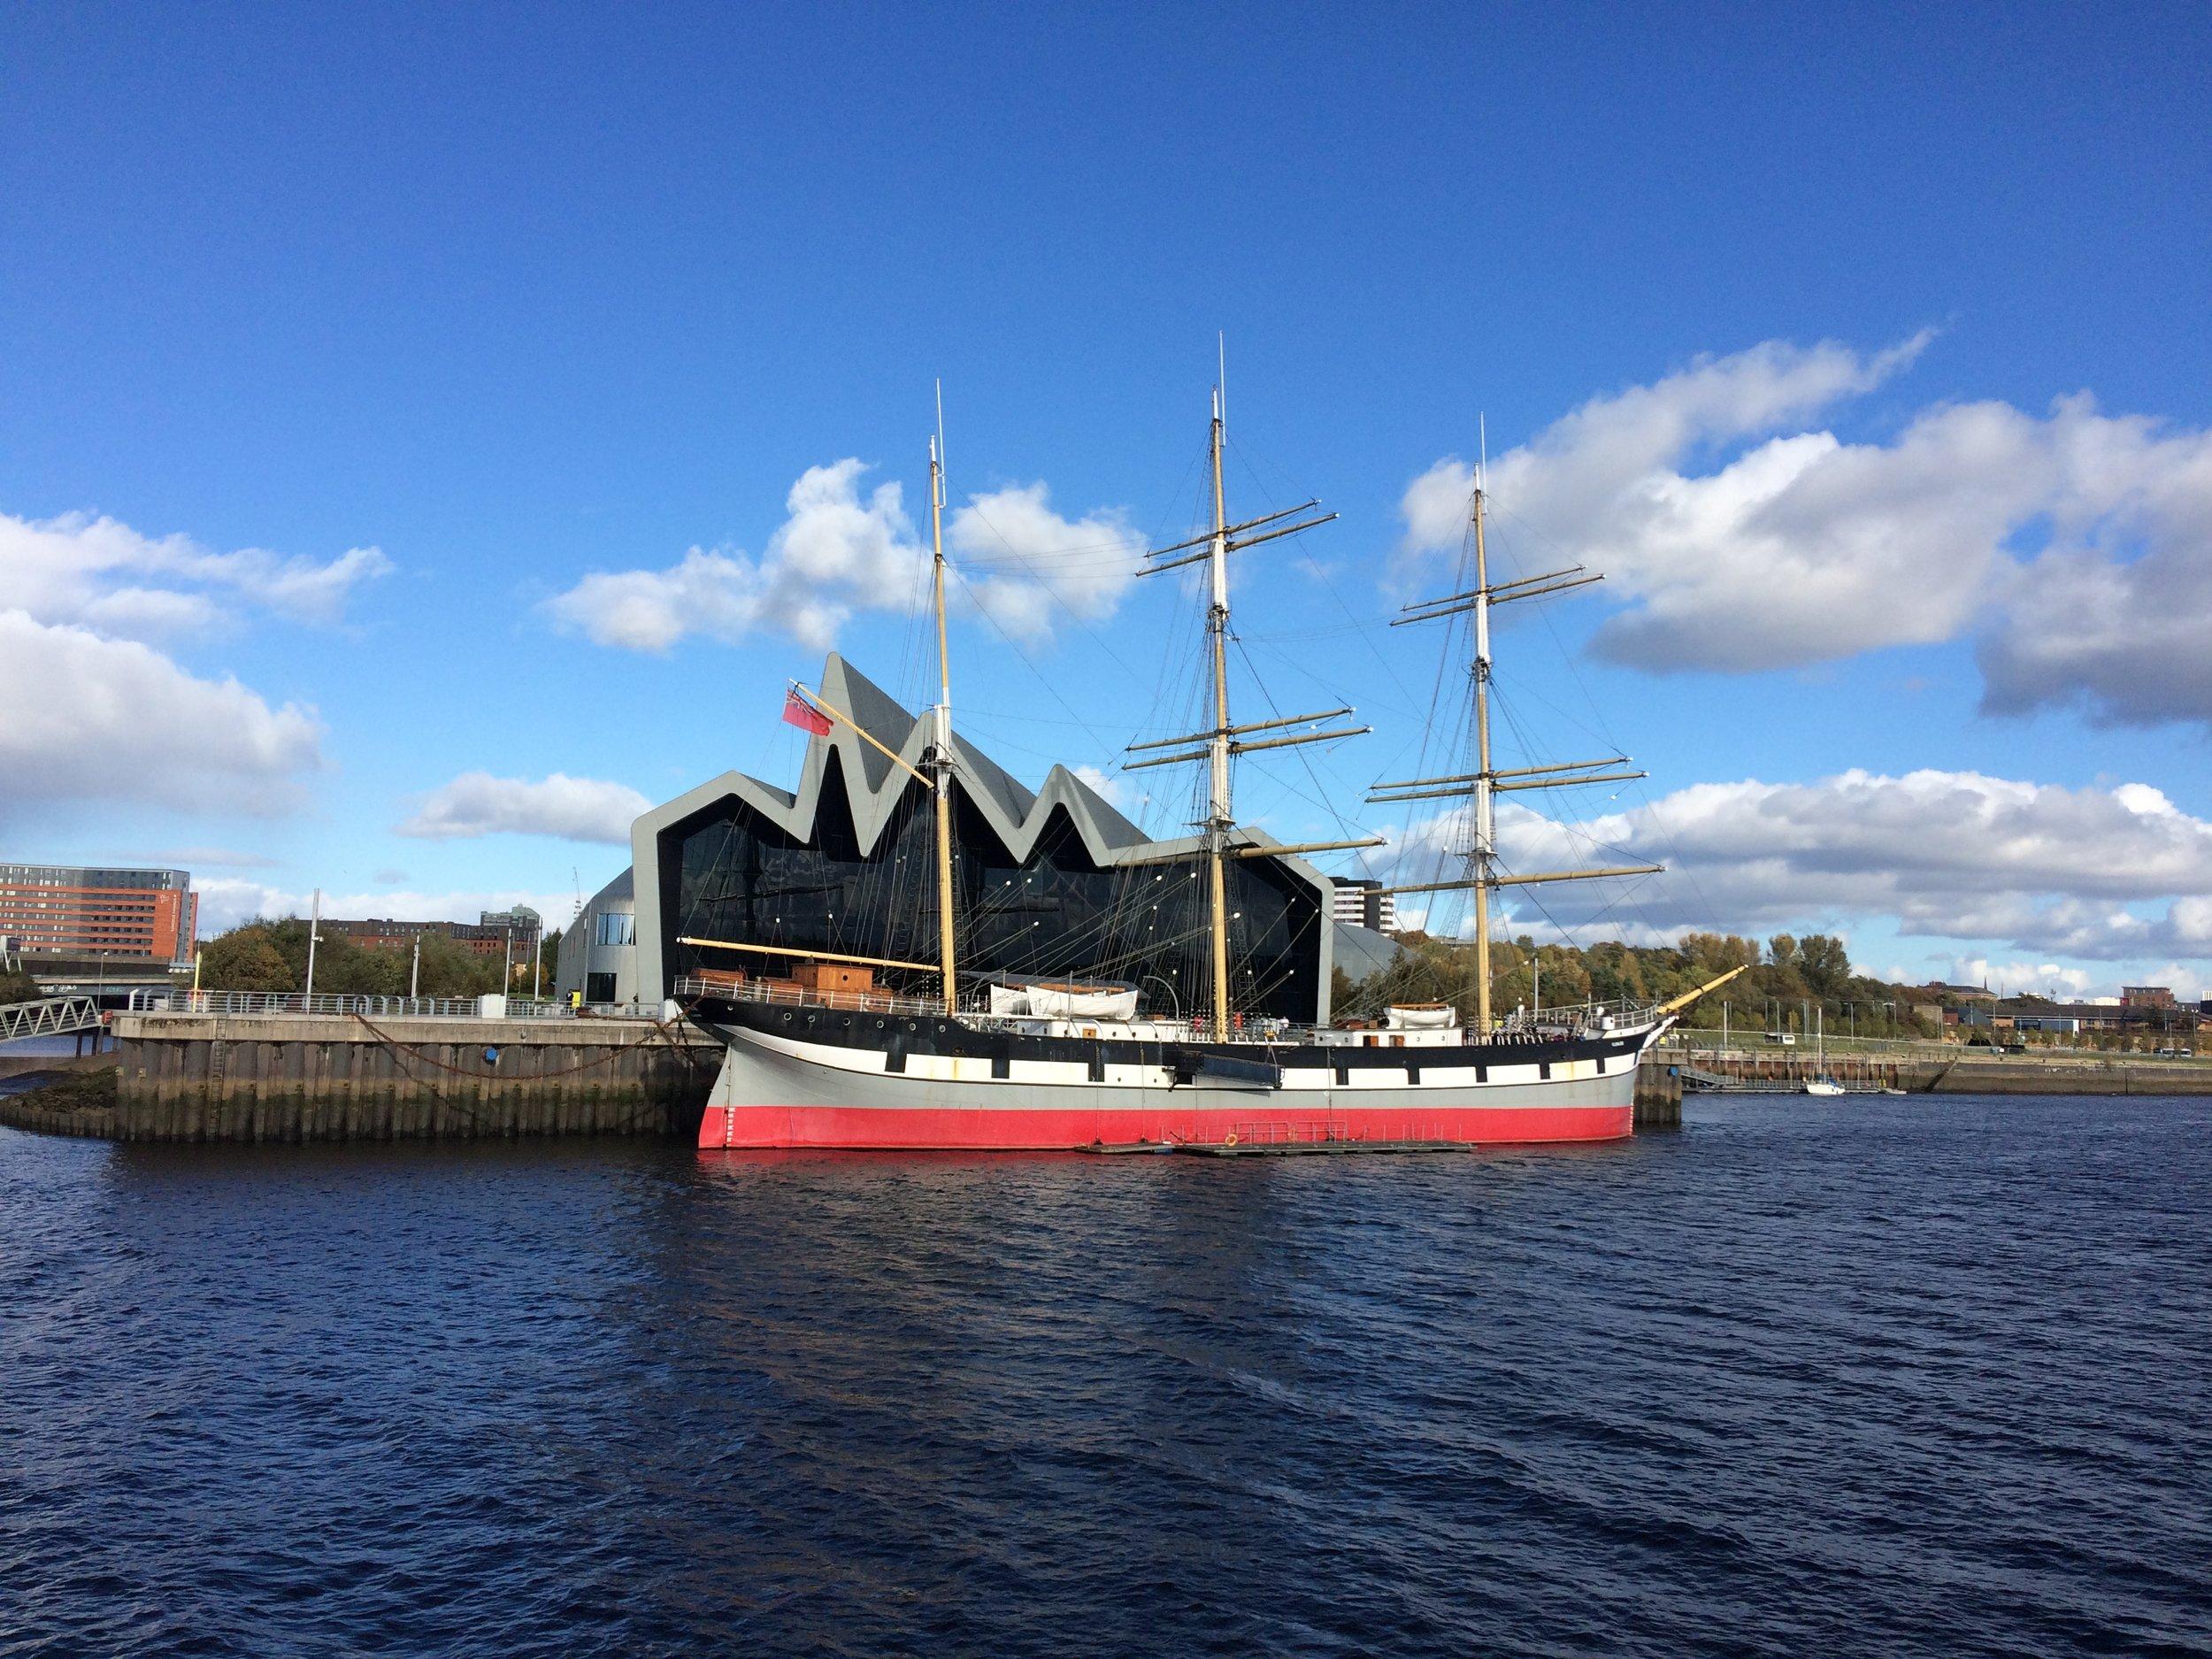 The Tall ship.JPG